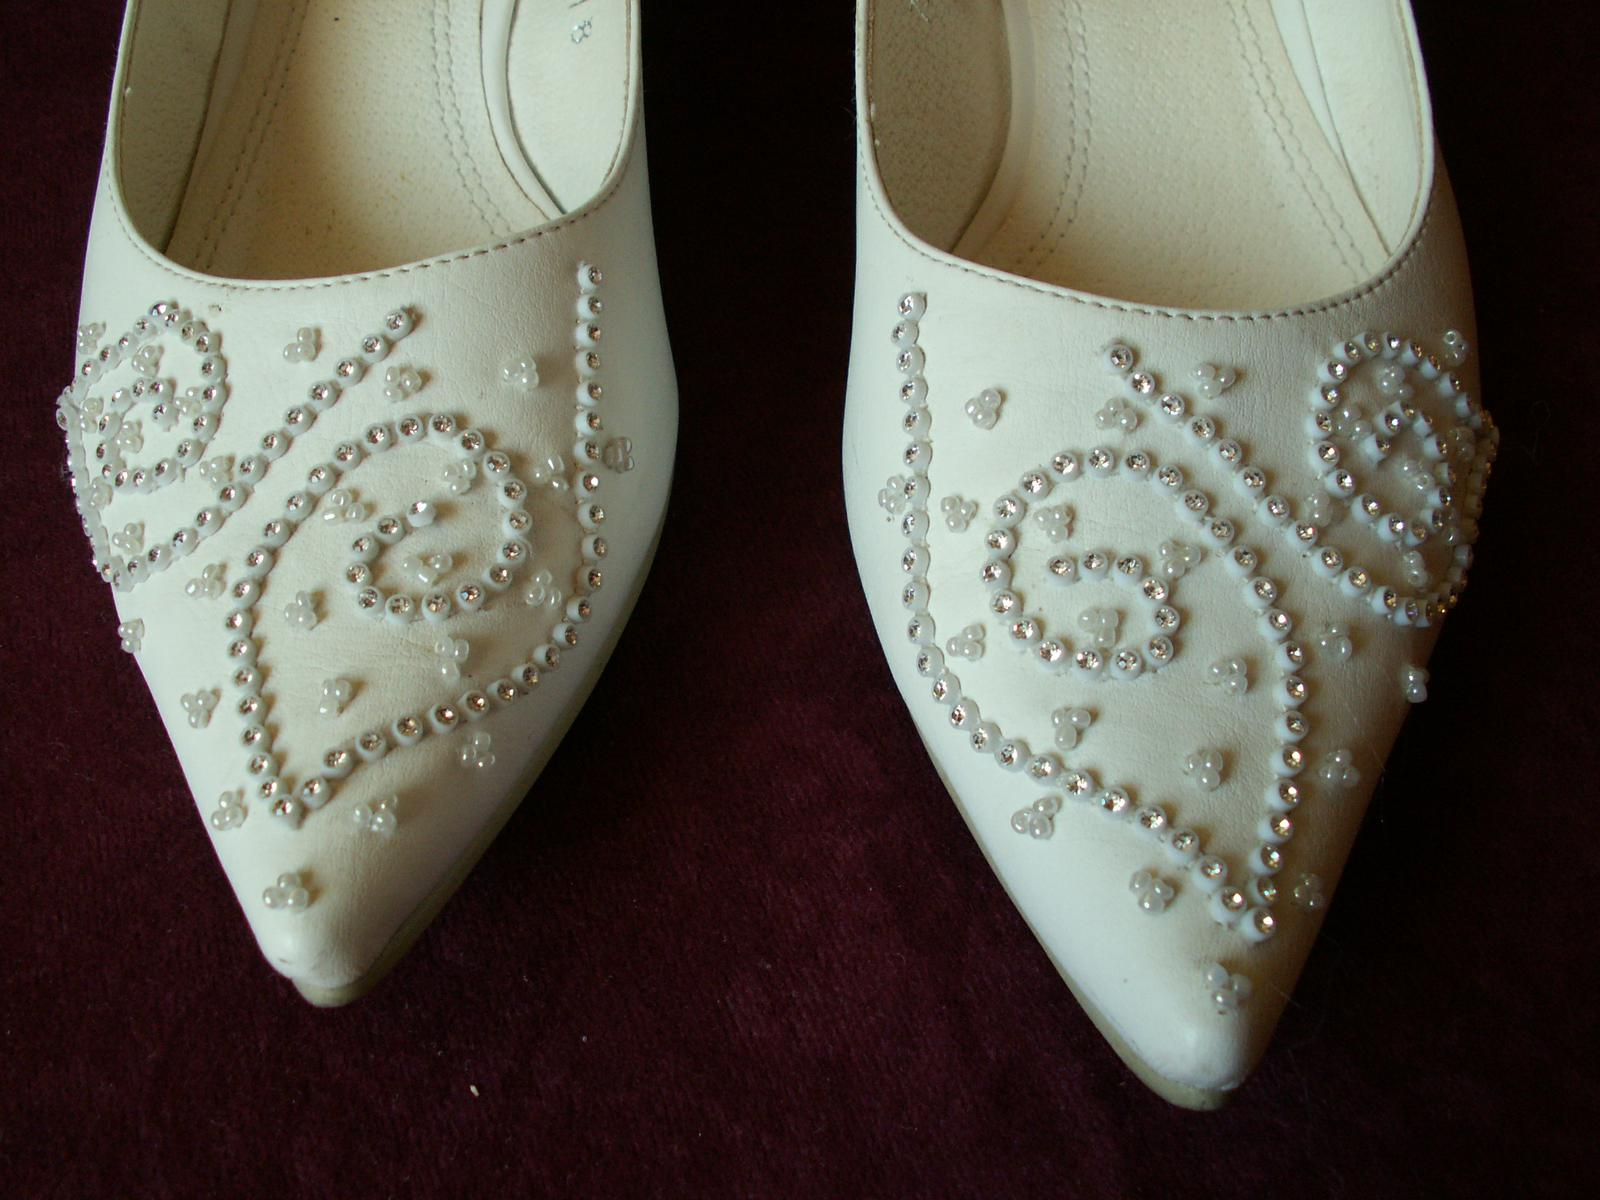 Biele svadobne topanky s krystalikmi 8486e7a74a0